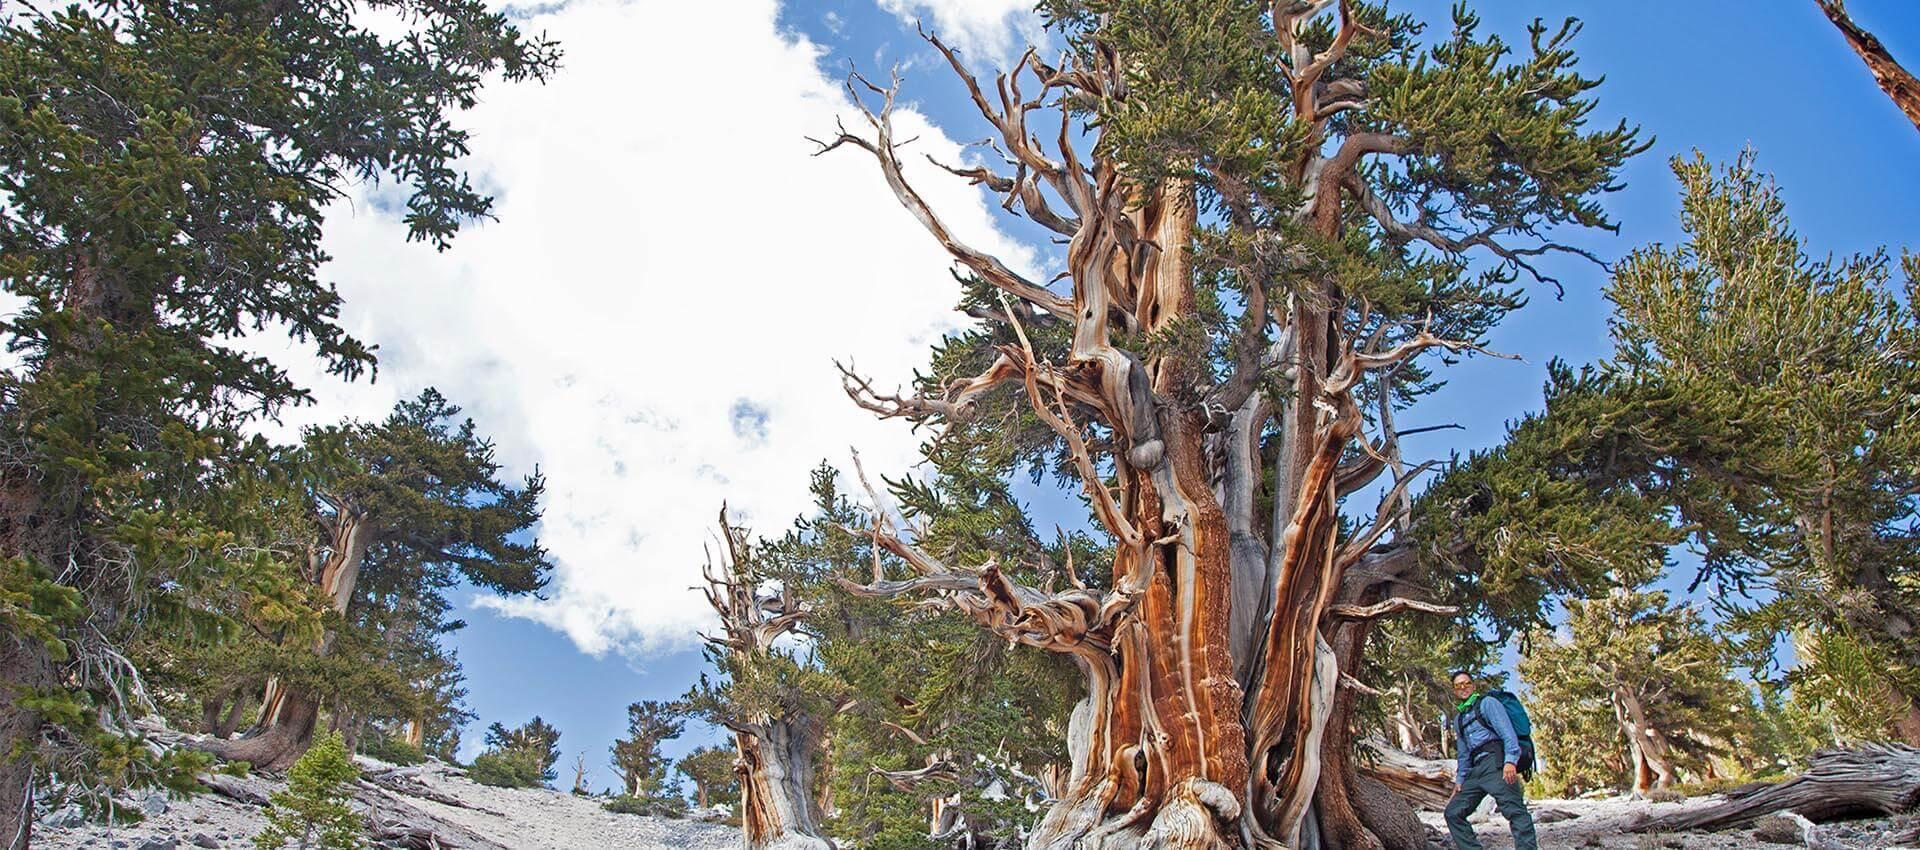 Bristlecone Pine, Nevada Bristlecone Pine, Great Basin National Park, Oldest Tree, Oldest Living Tree